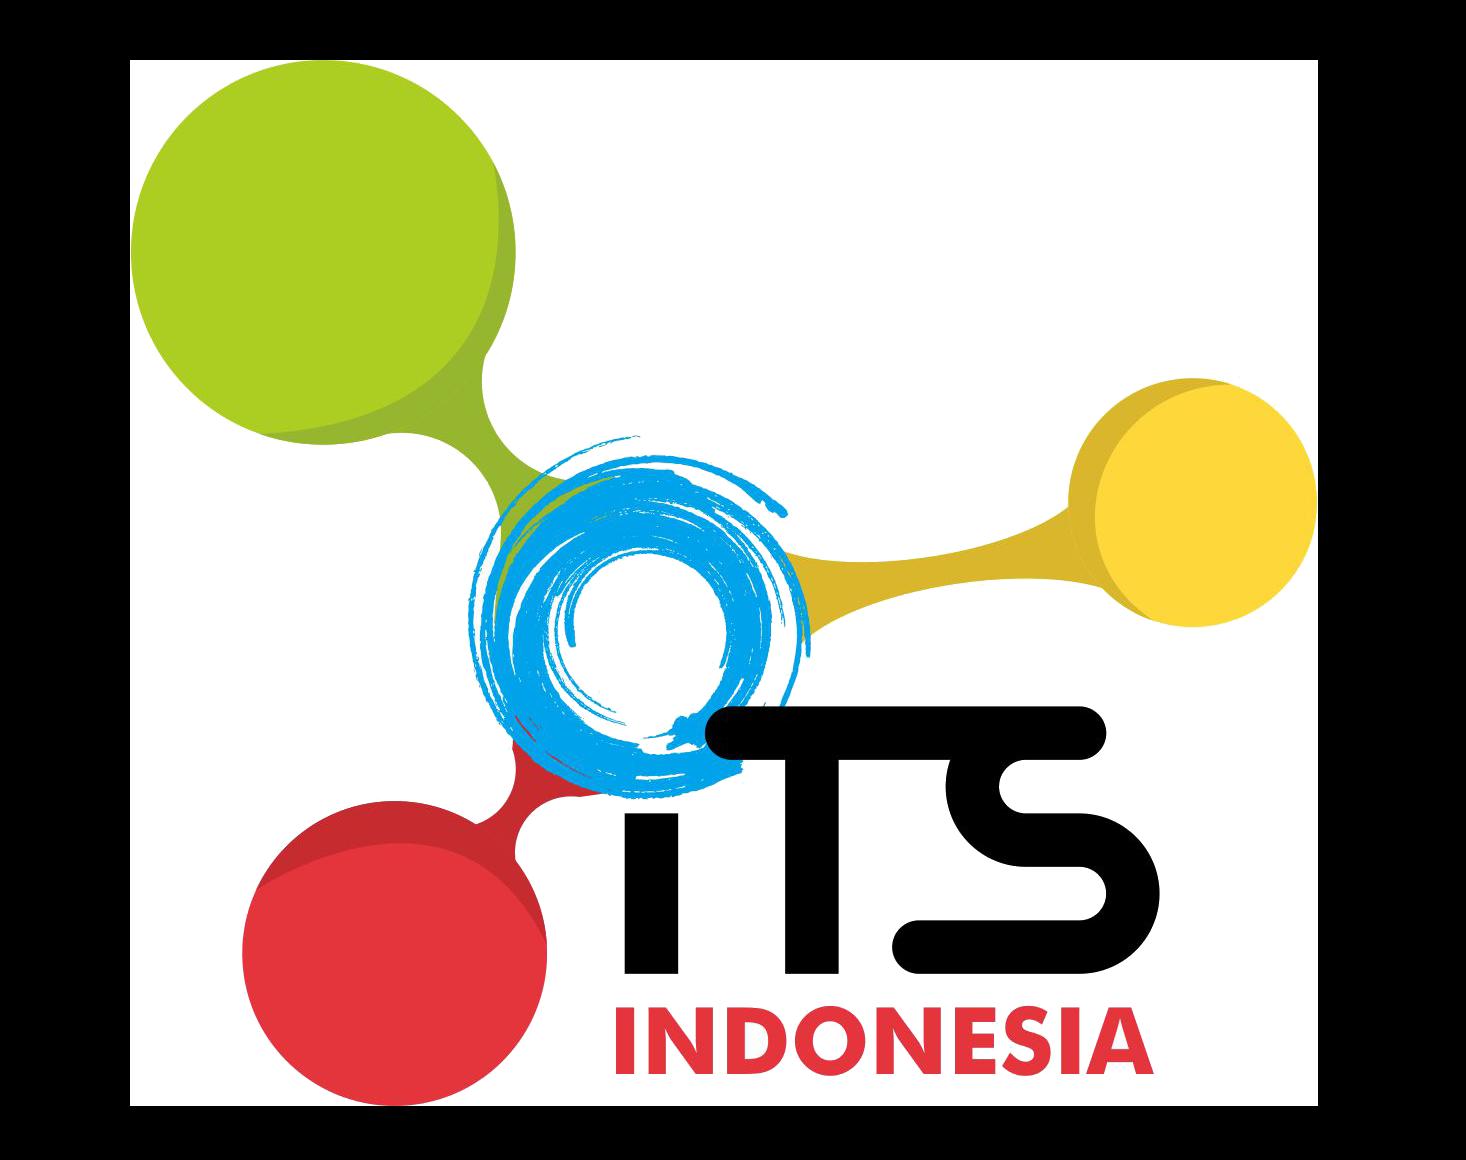 Intelligent Transport System (ITS) Indonesia